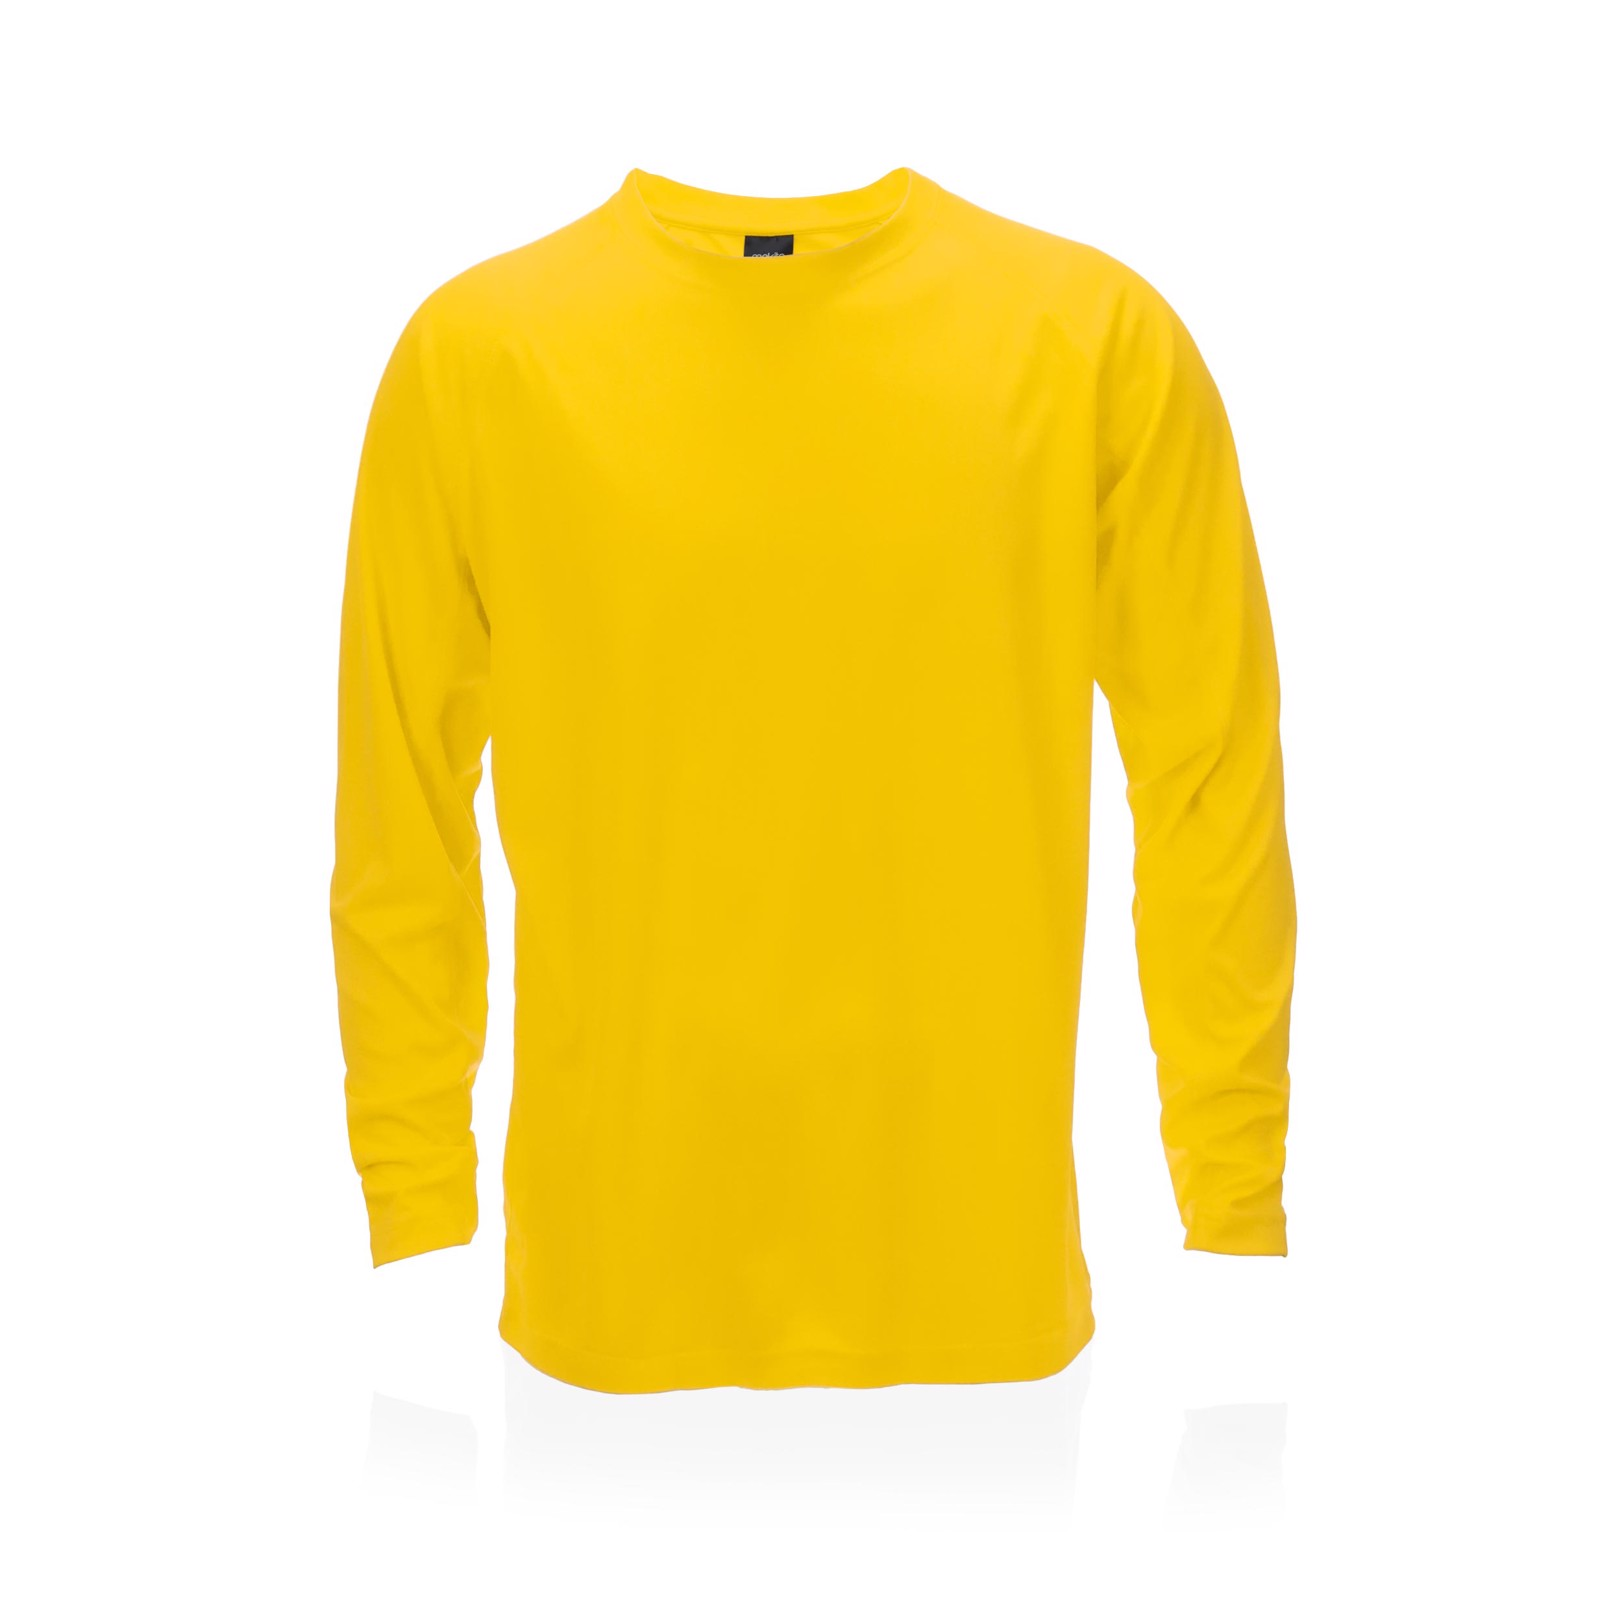 Camiseta Adulto Tecnik Maik - Amarillo / L